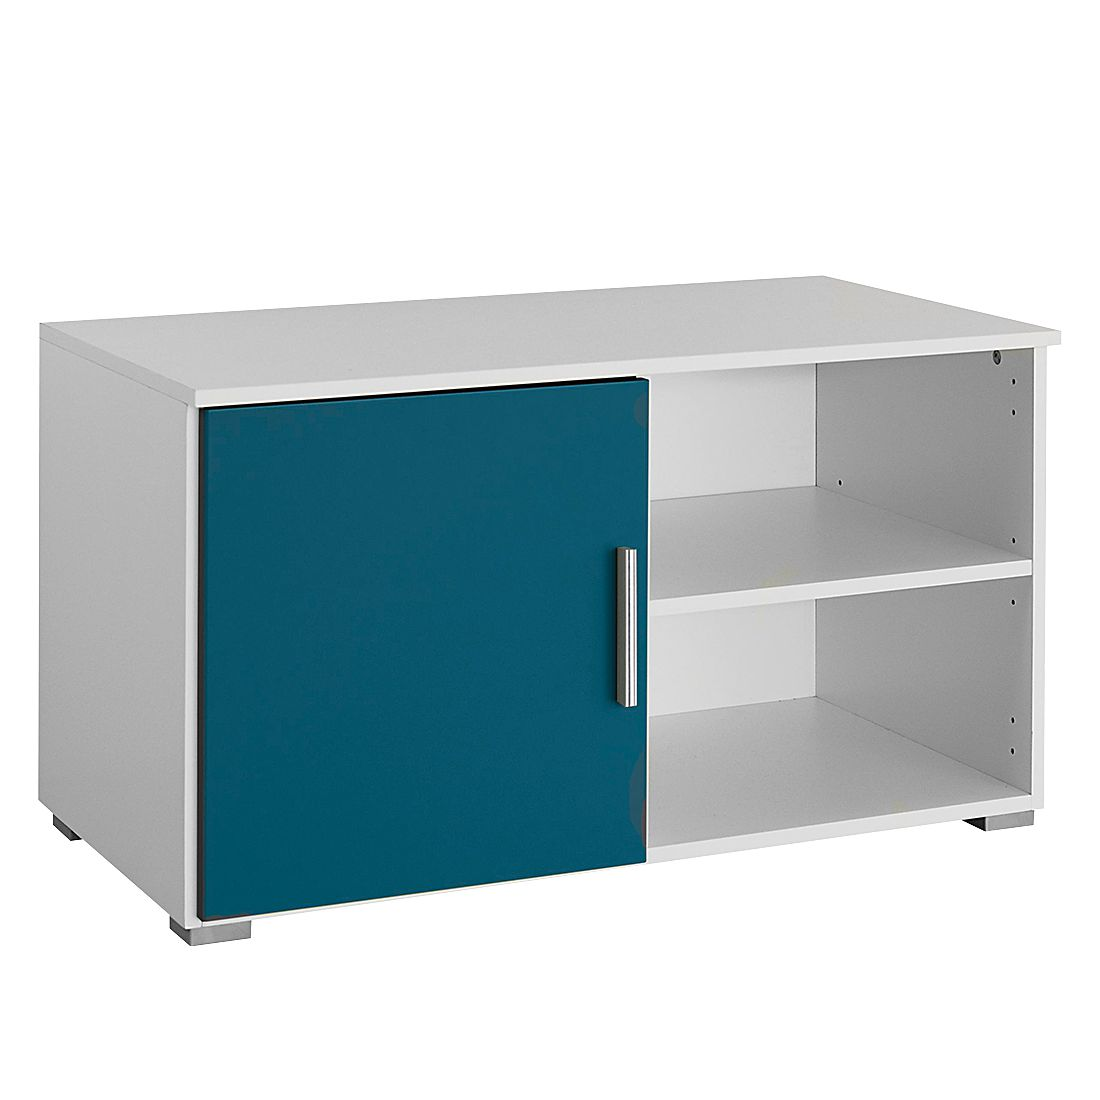 tv lowboard saresa wei petrol rauch pack s g nstig online kaufen. Black Bedroom Furniture Sets. Home Design Ideas